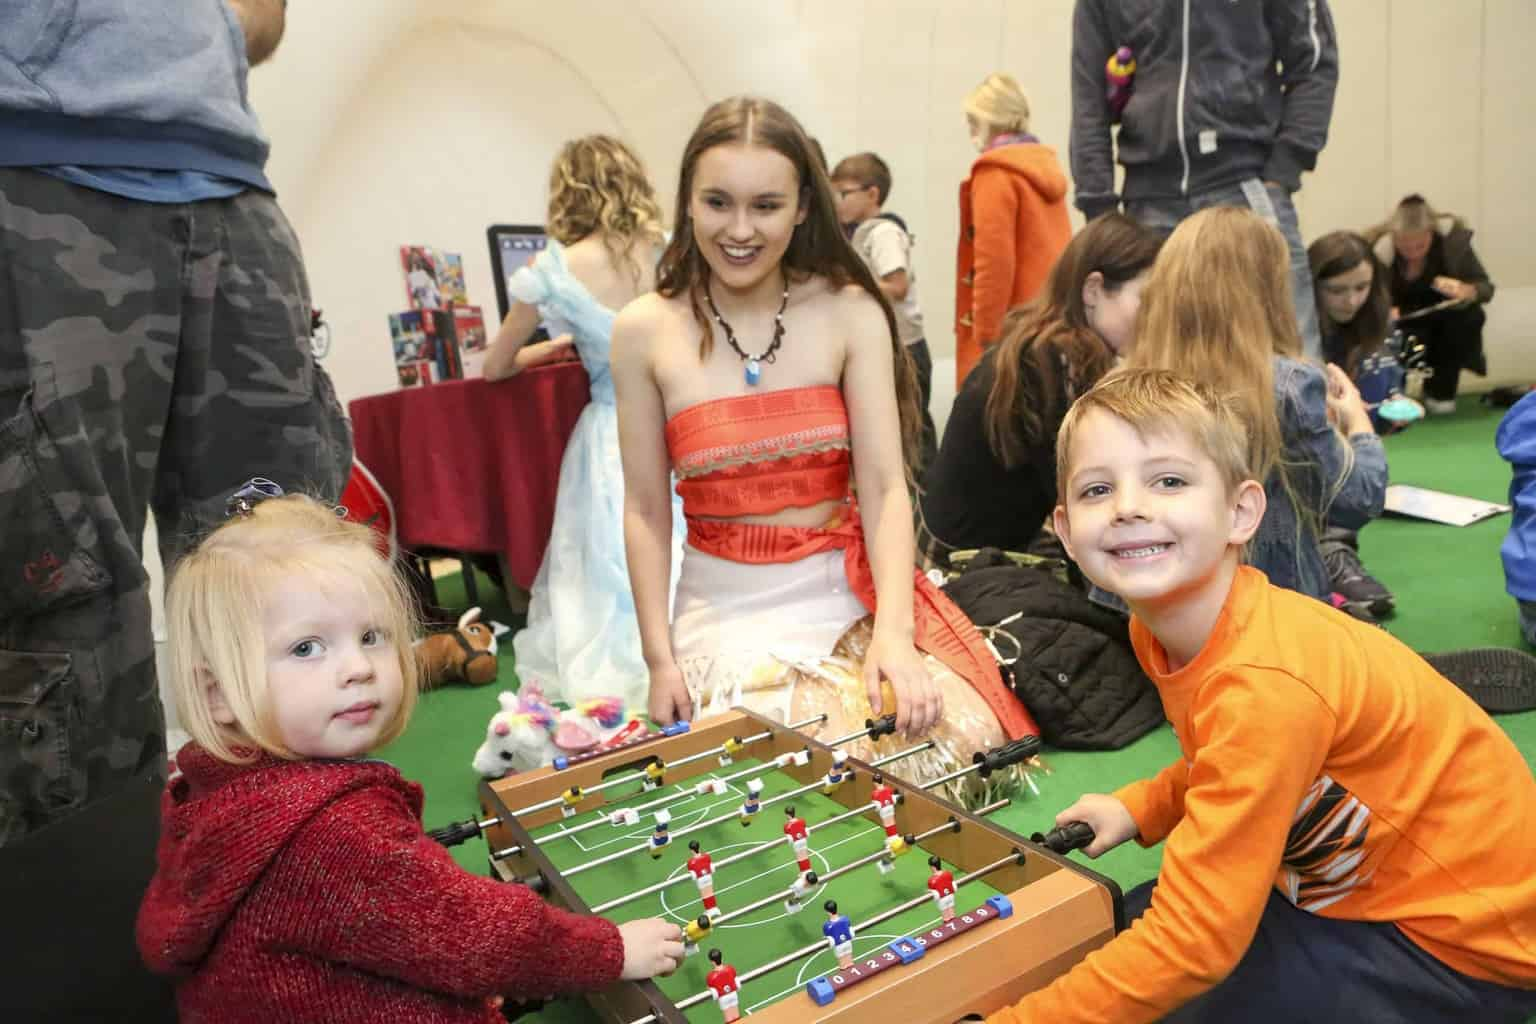 Queensgate Toy Testing in Peterborough